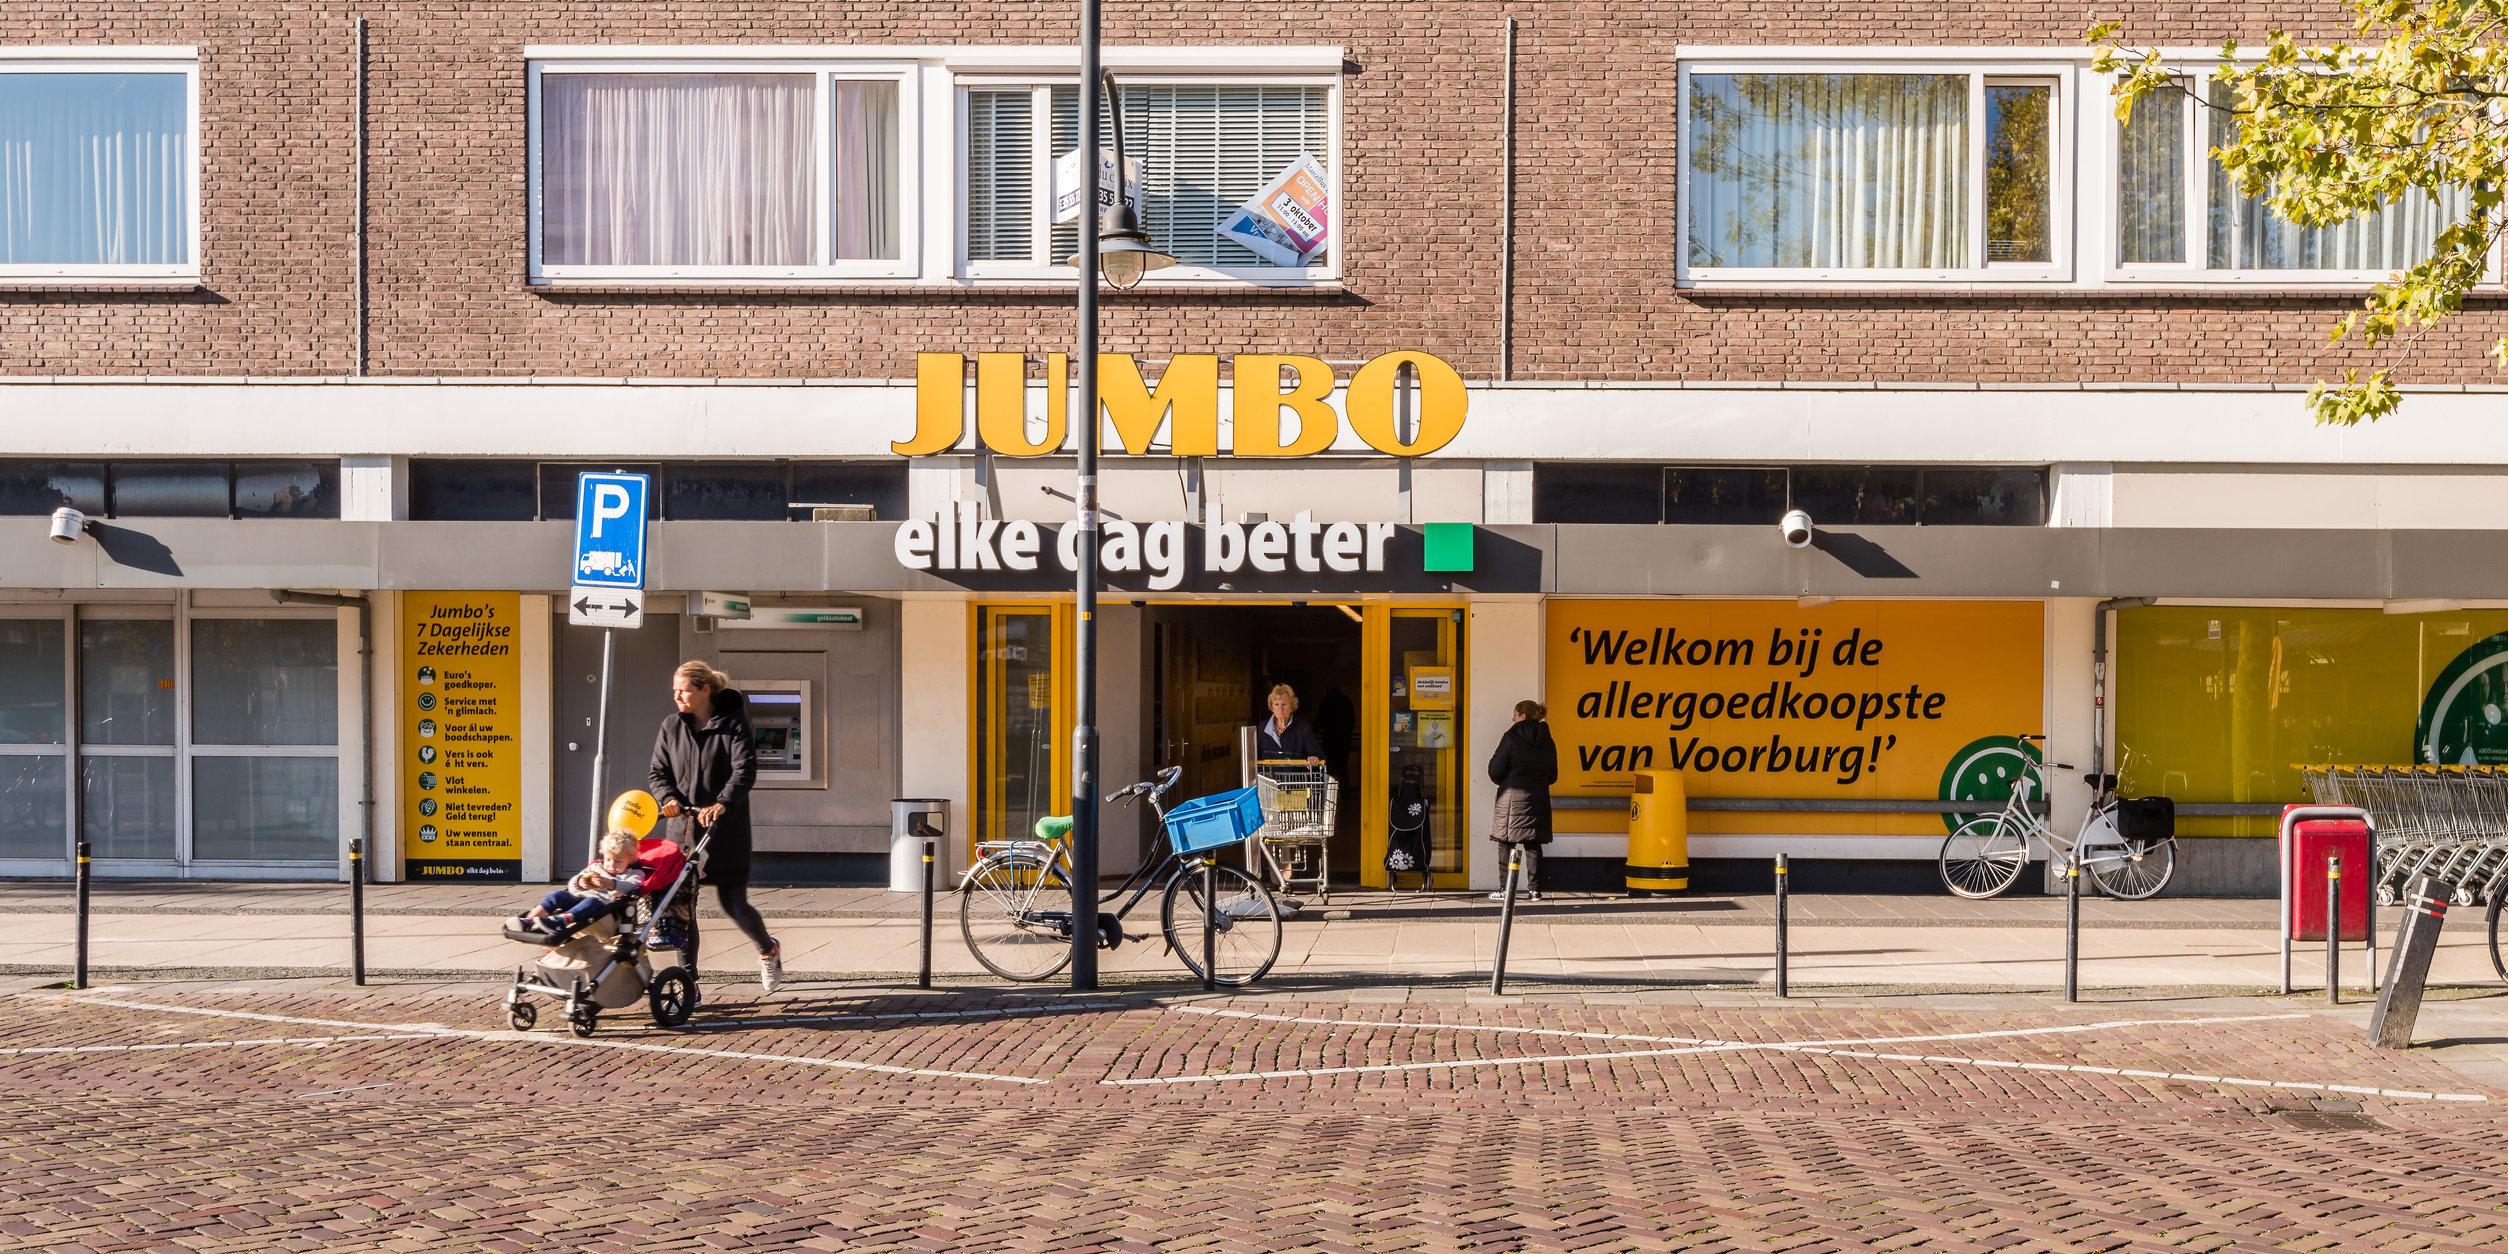 Jumbo, Voorburg i.o.v. a.s.r. vastgoed vermogensbeheer